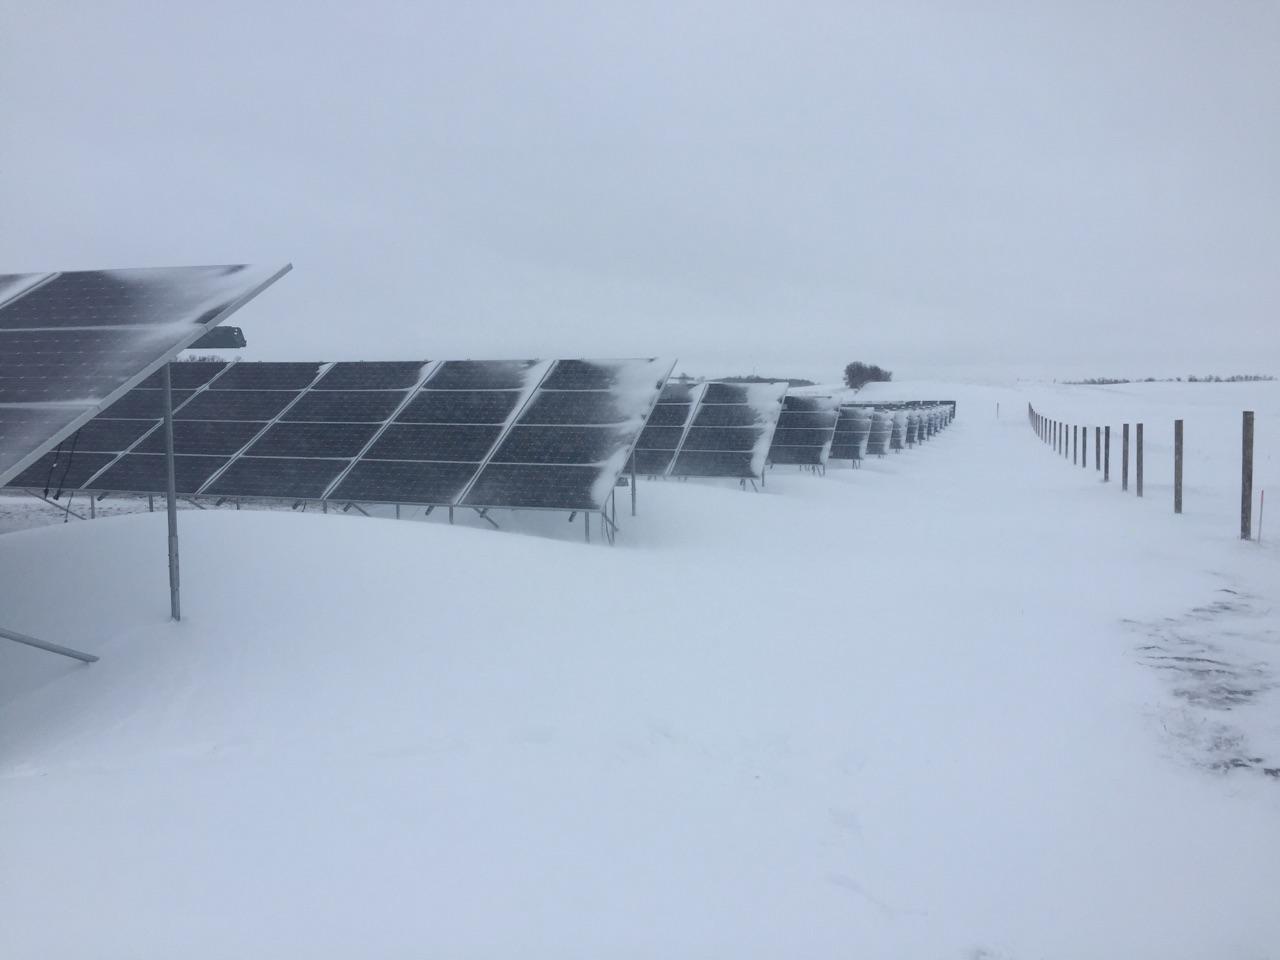 Winter Snow Project